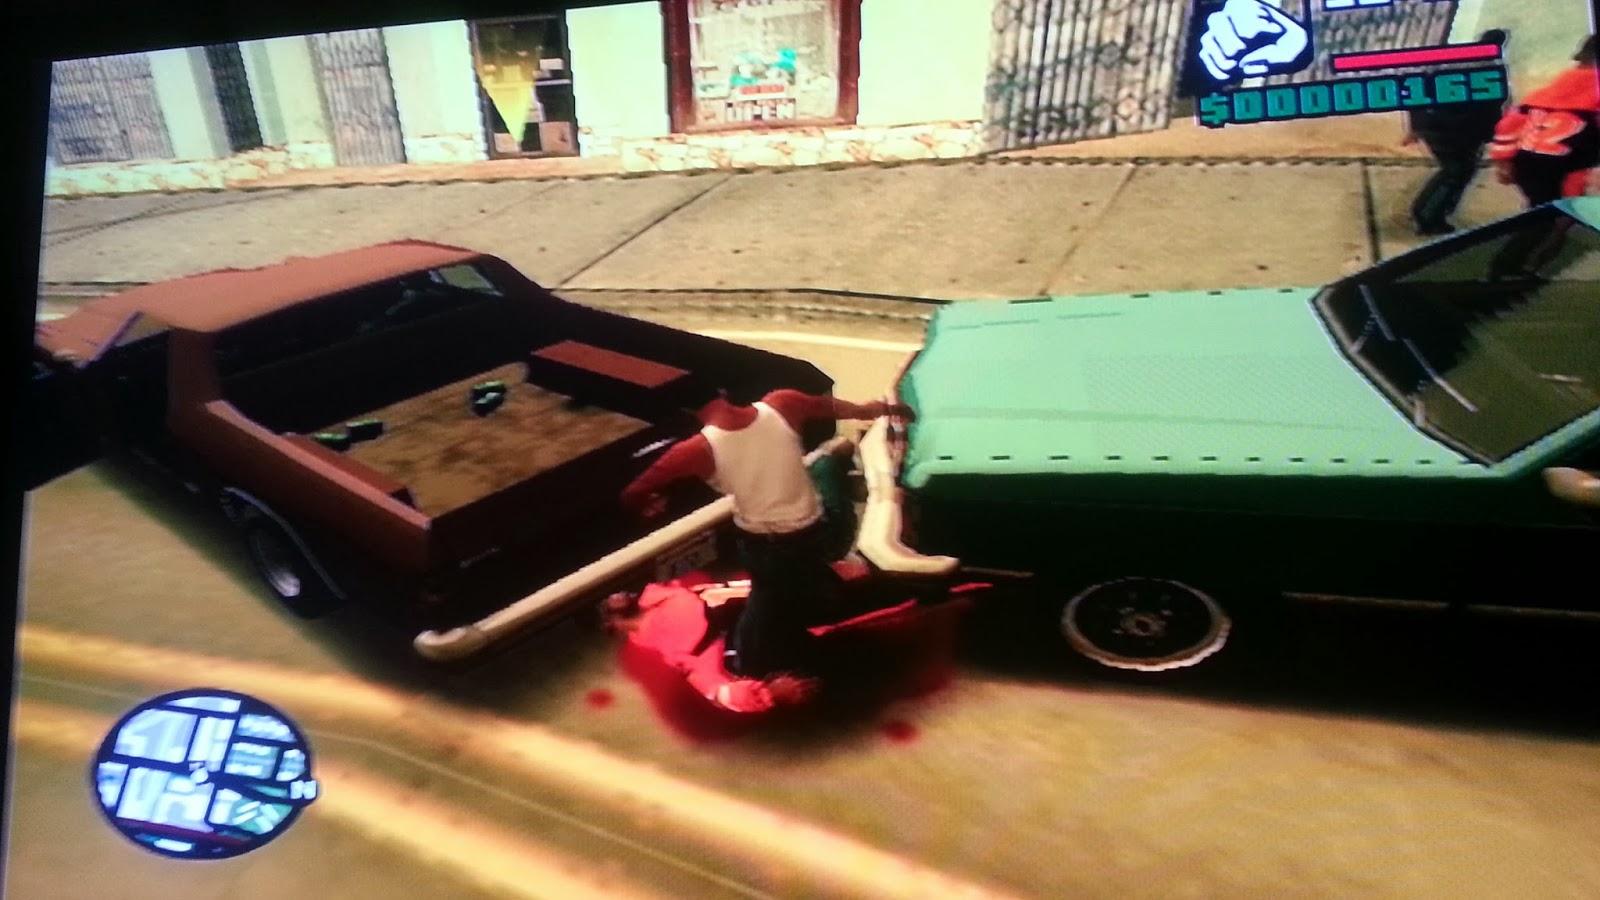 Corona Jumper: Grand Theft Auto: San Andreas (Playstation 2, 2004)